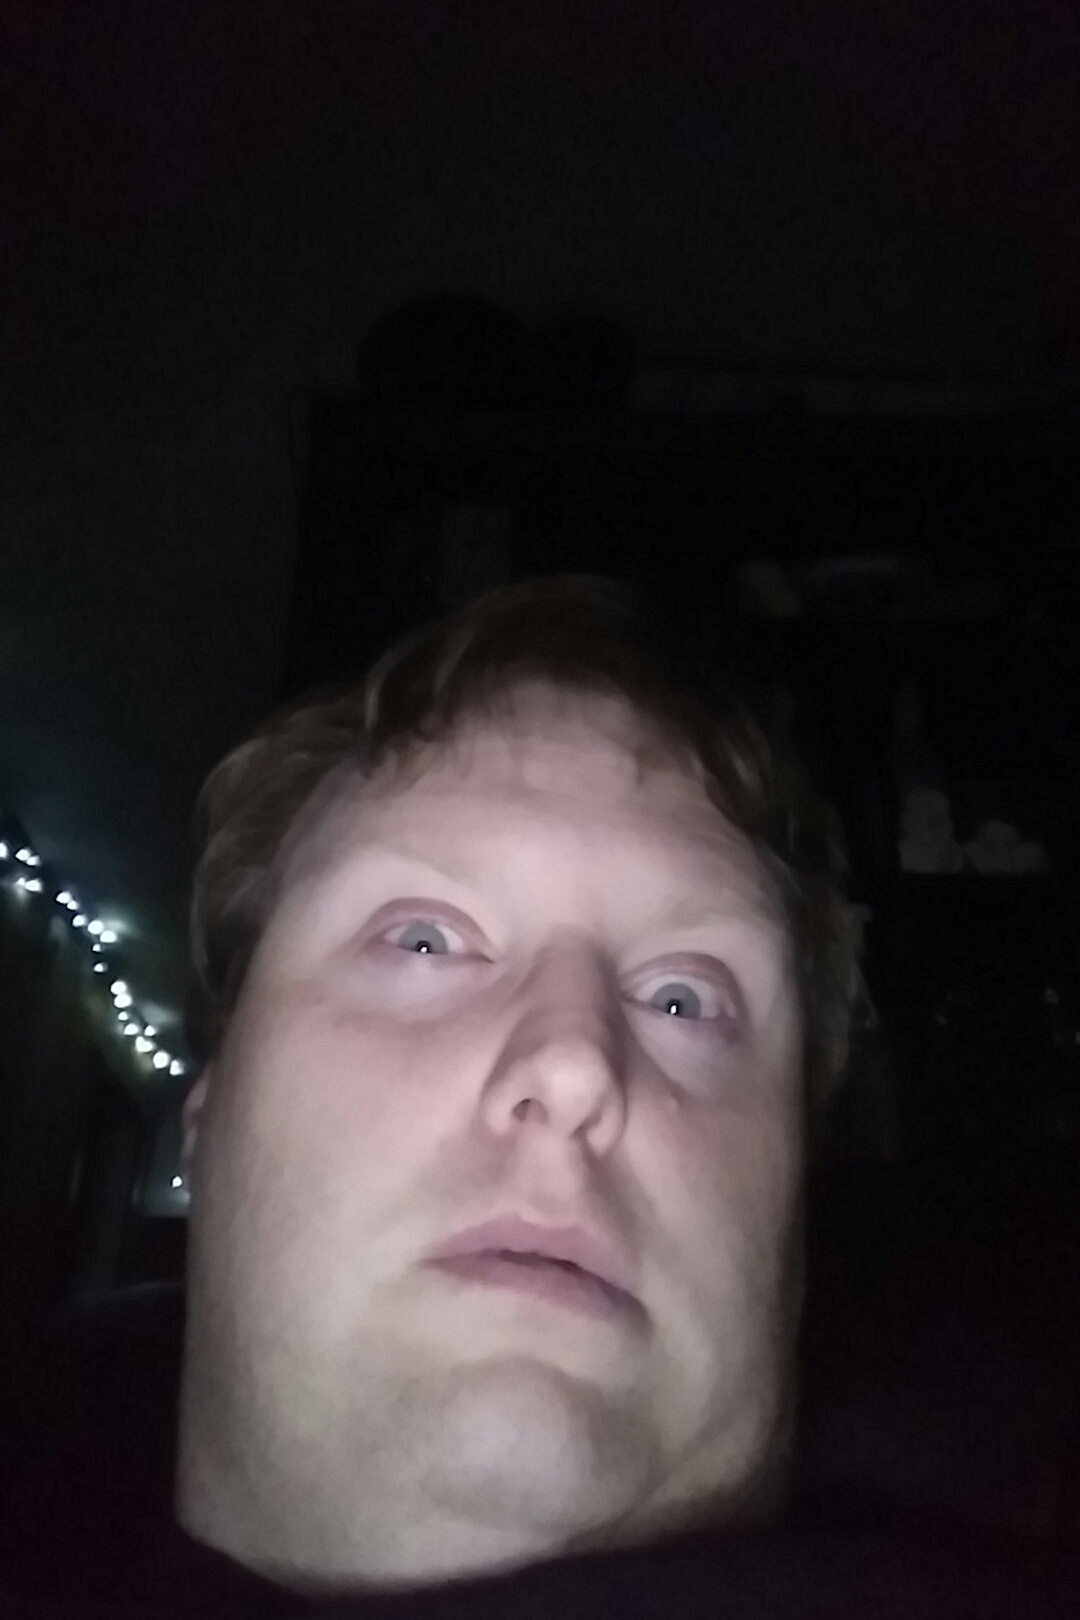 Blair Witch selfie